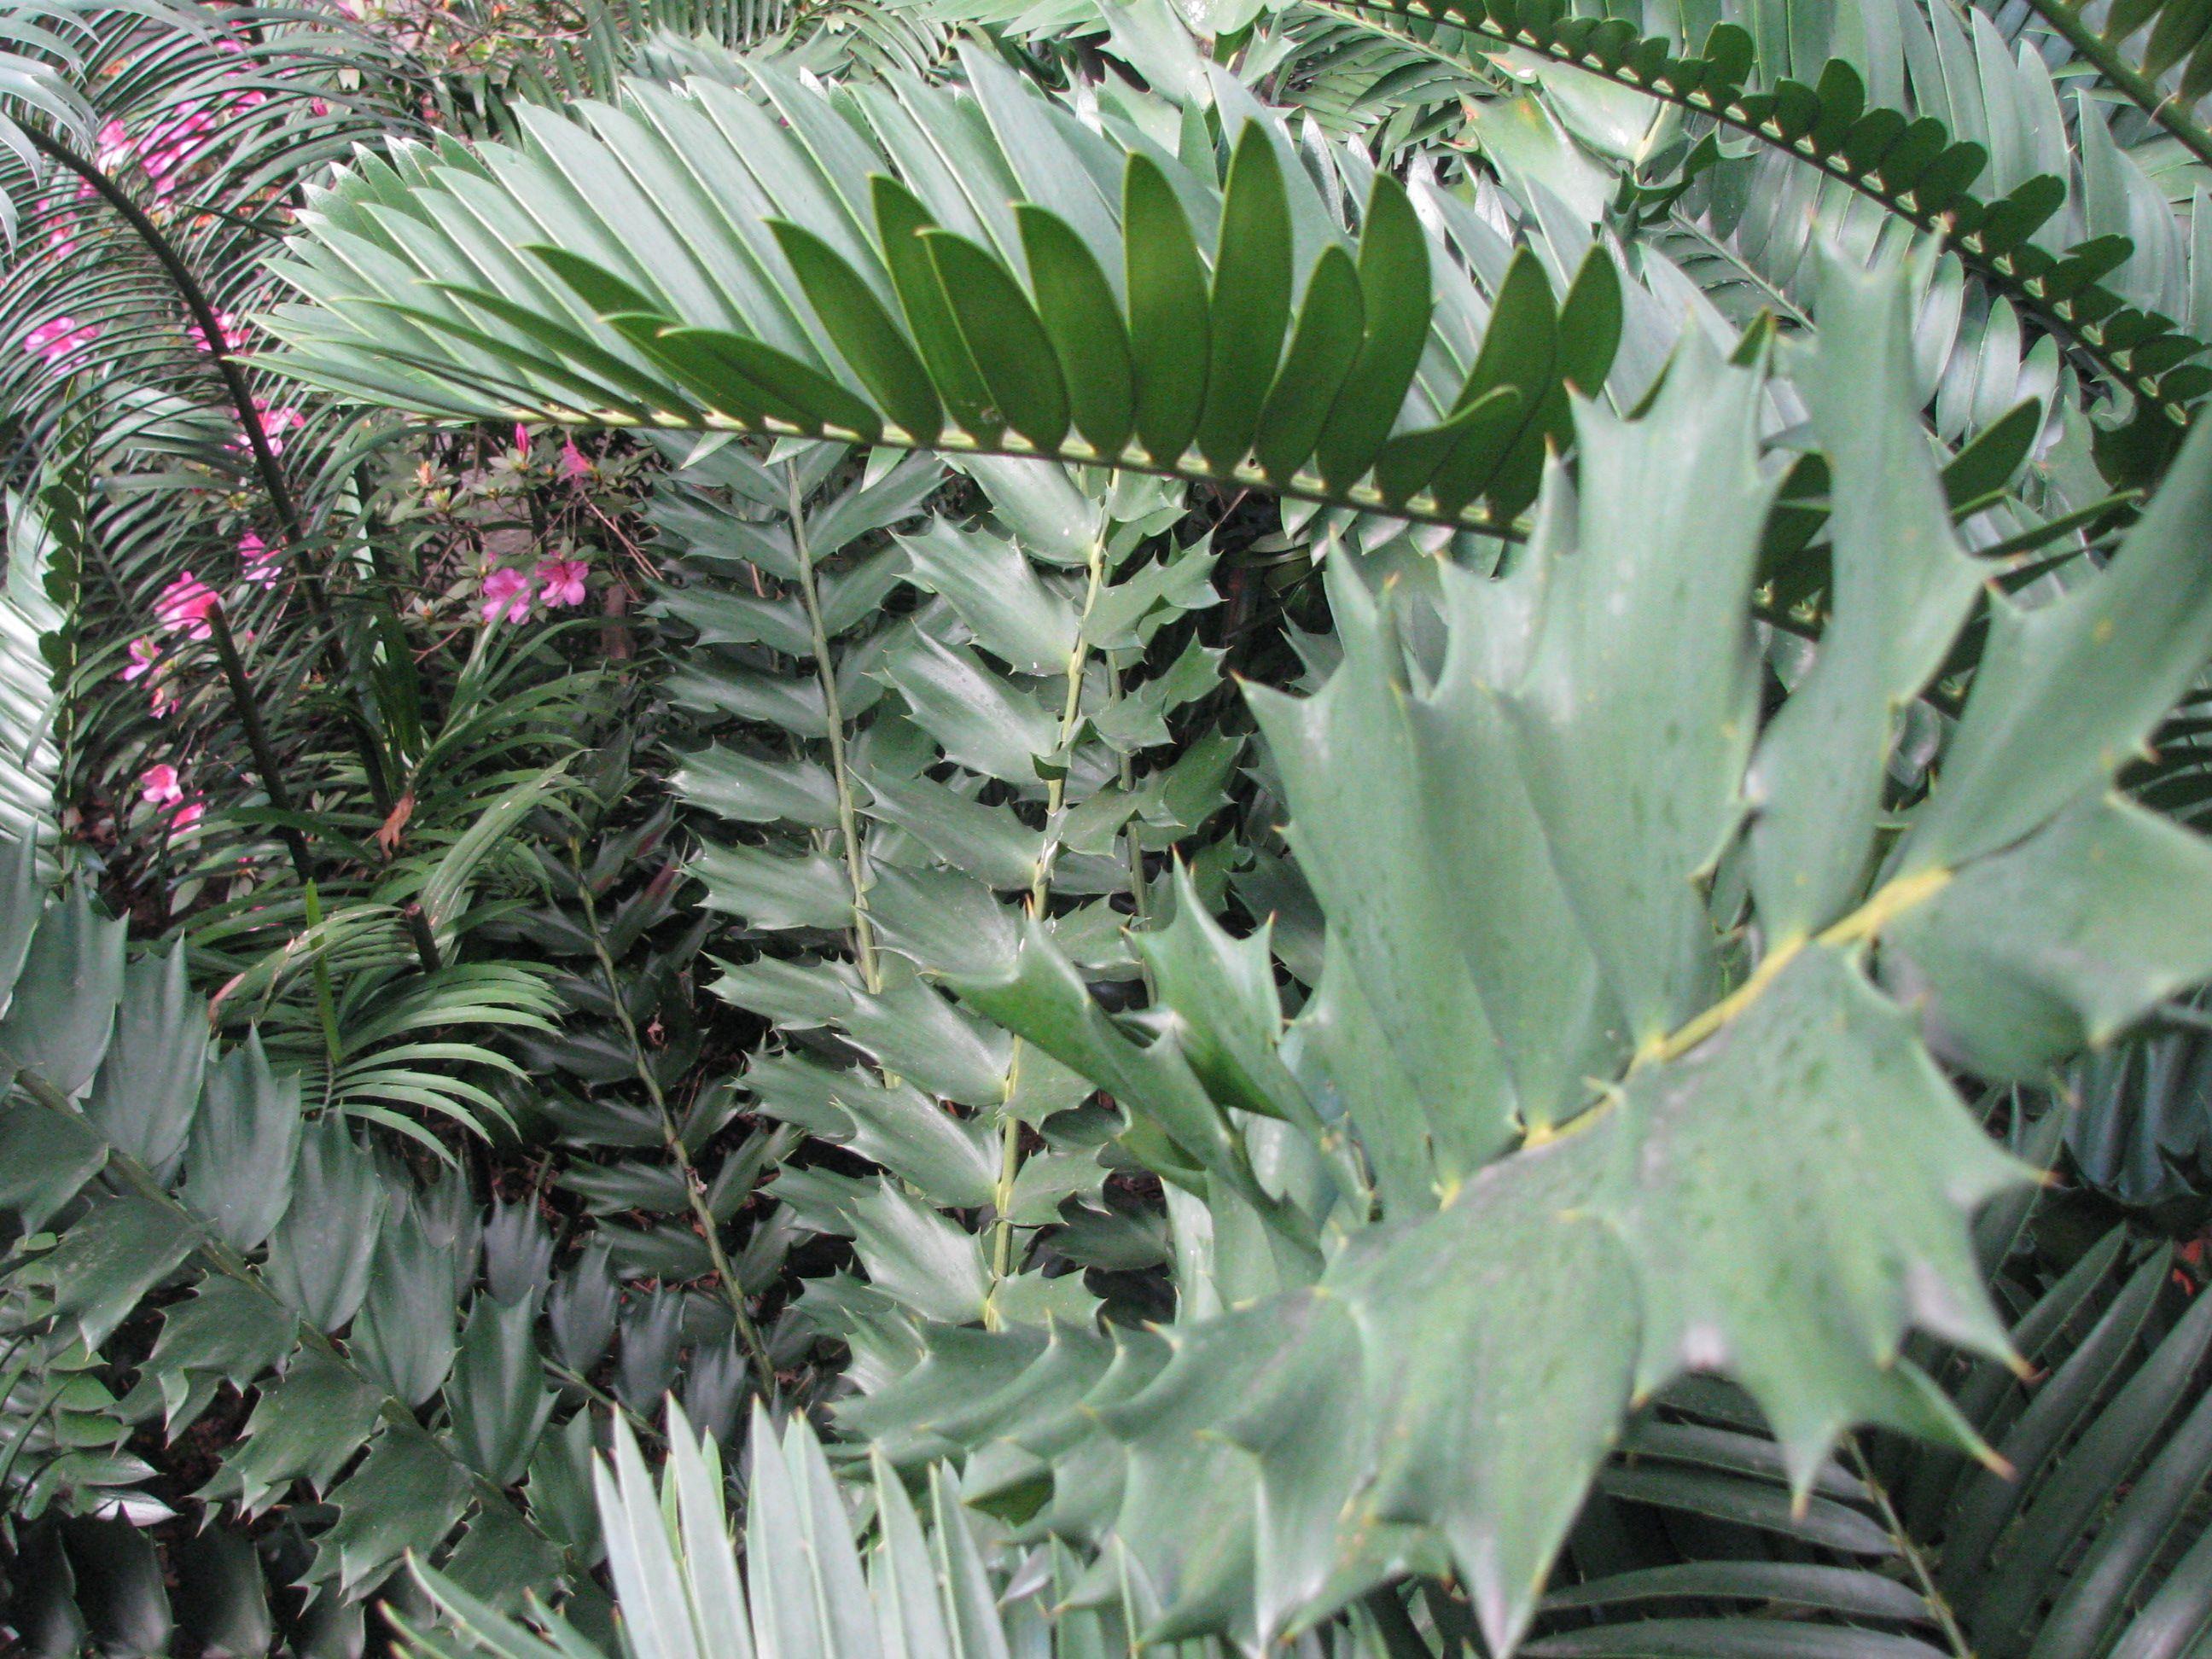 Encephalartos Ferox South African Cycad That Has Broad